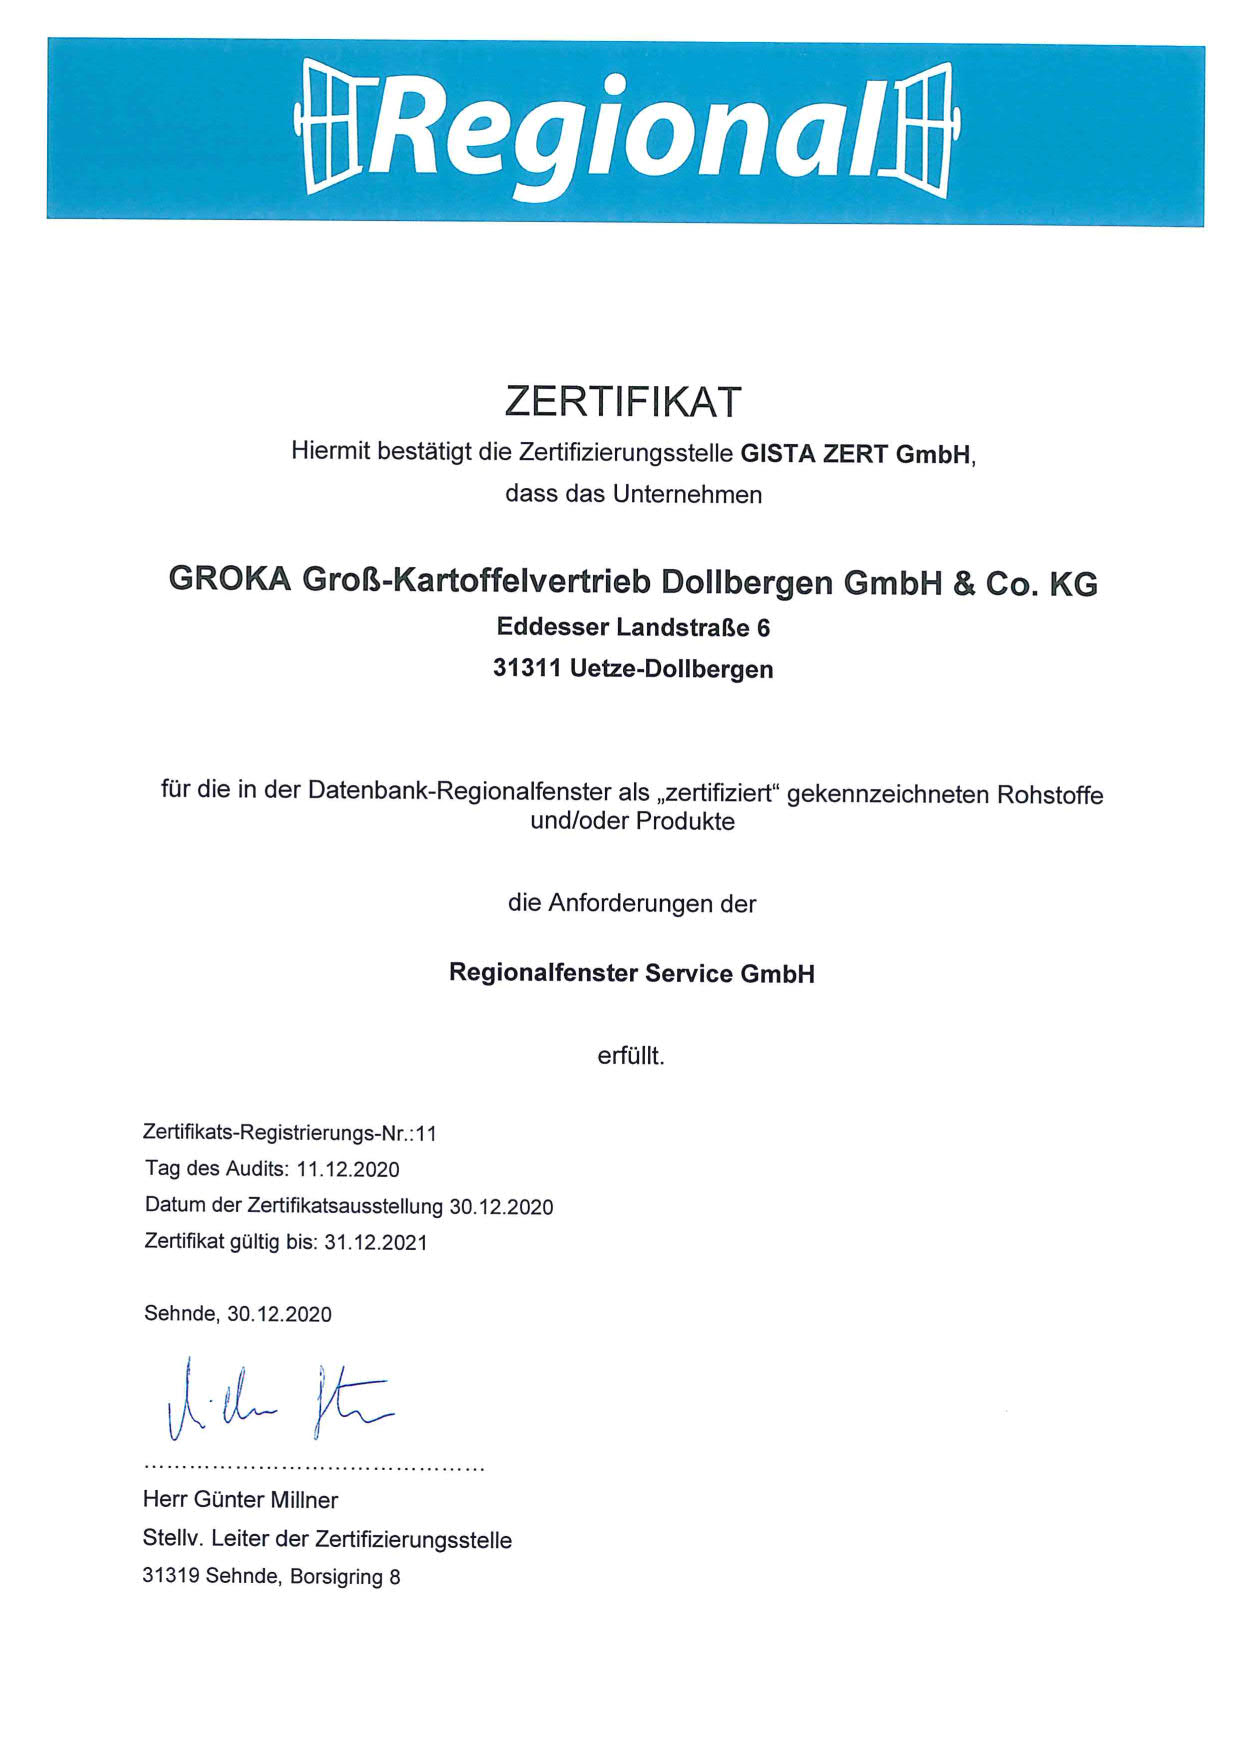 RF_2019_GROKA_Grosskartoffelvertrieb_GmbH__Co._KG_1.jpg